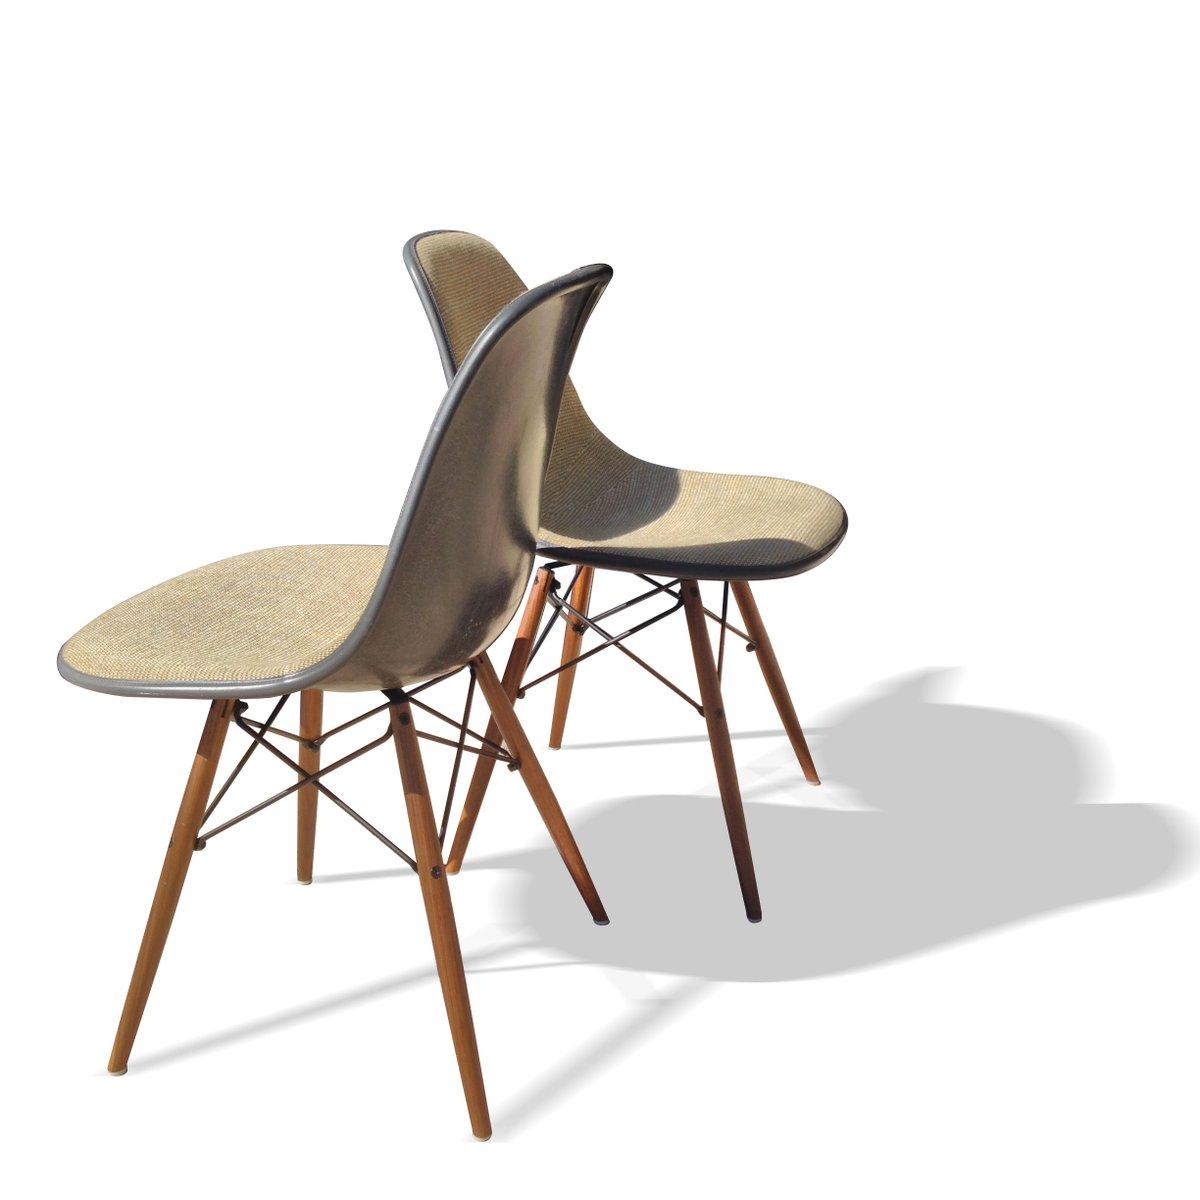 graue dsw st hle von charles und ray eames f r herman. Black Bedroom Furniture Sets. Home Design Ideas